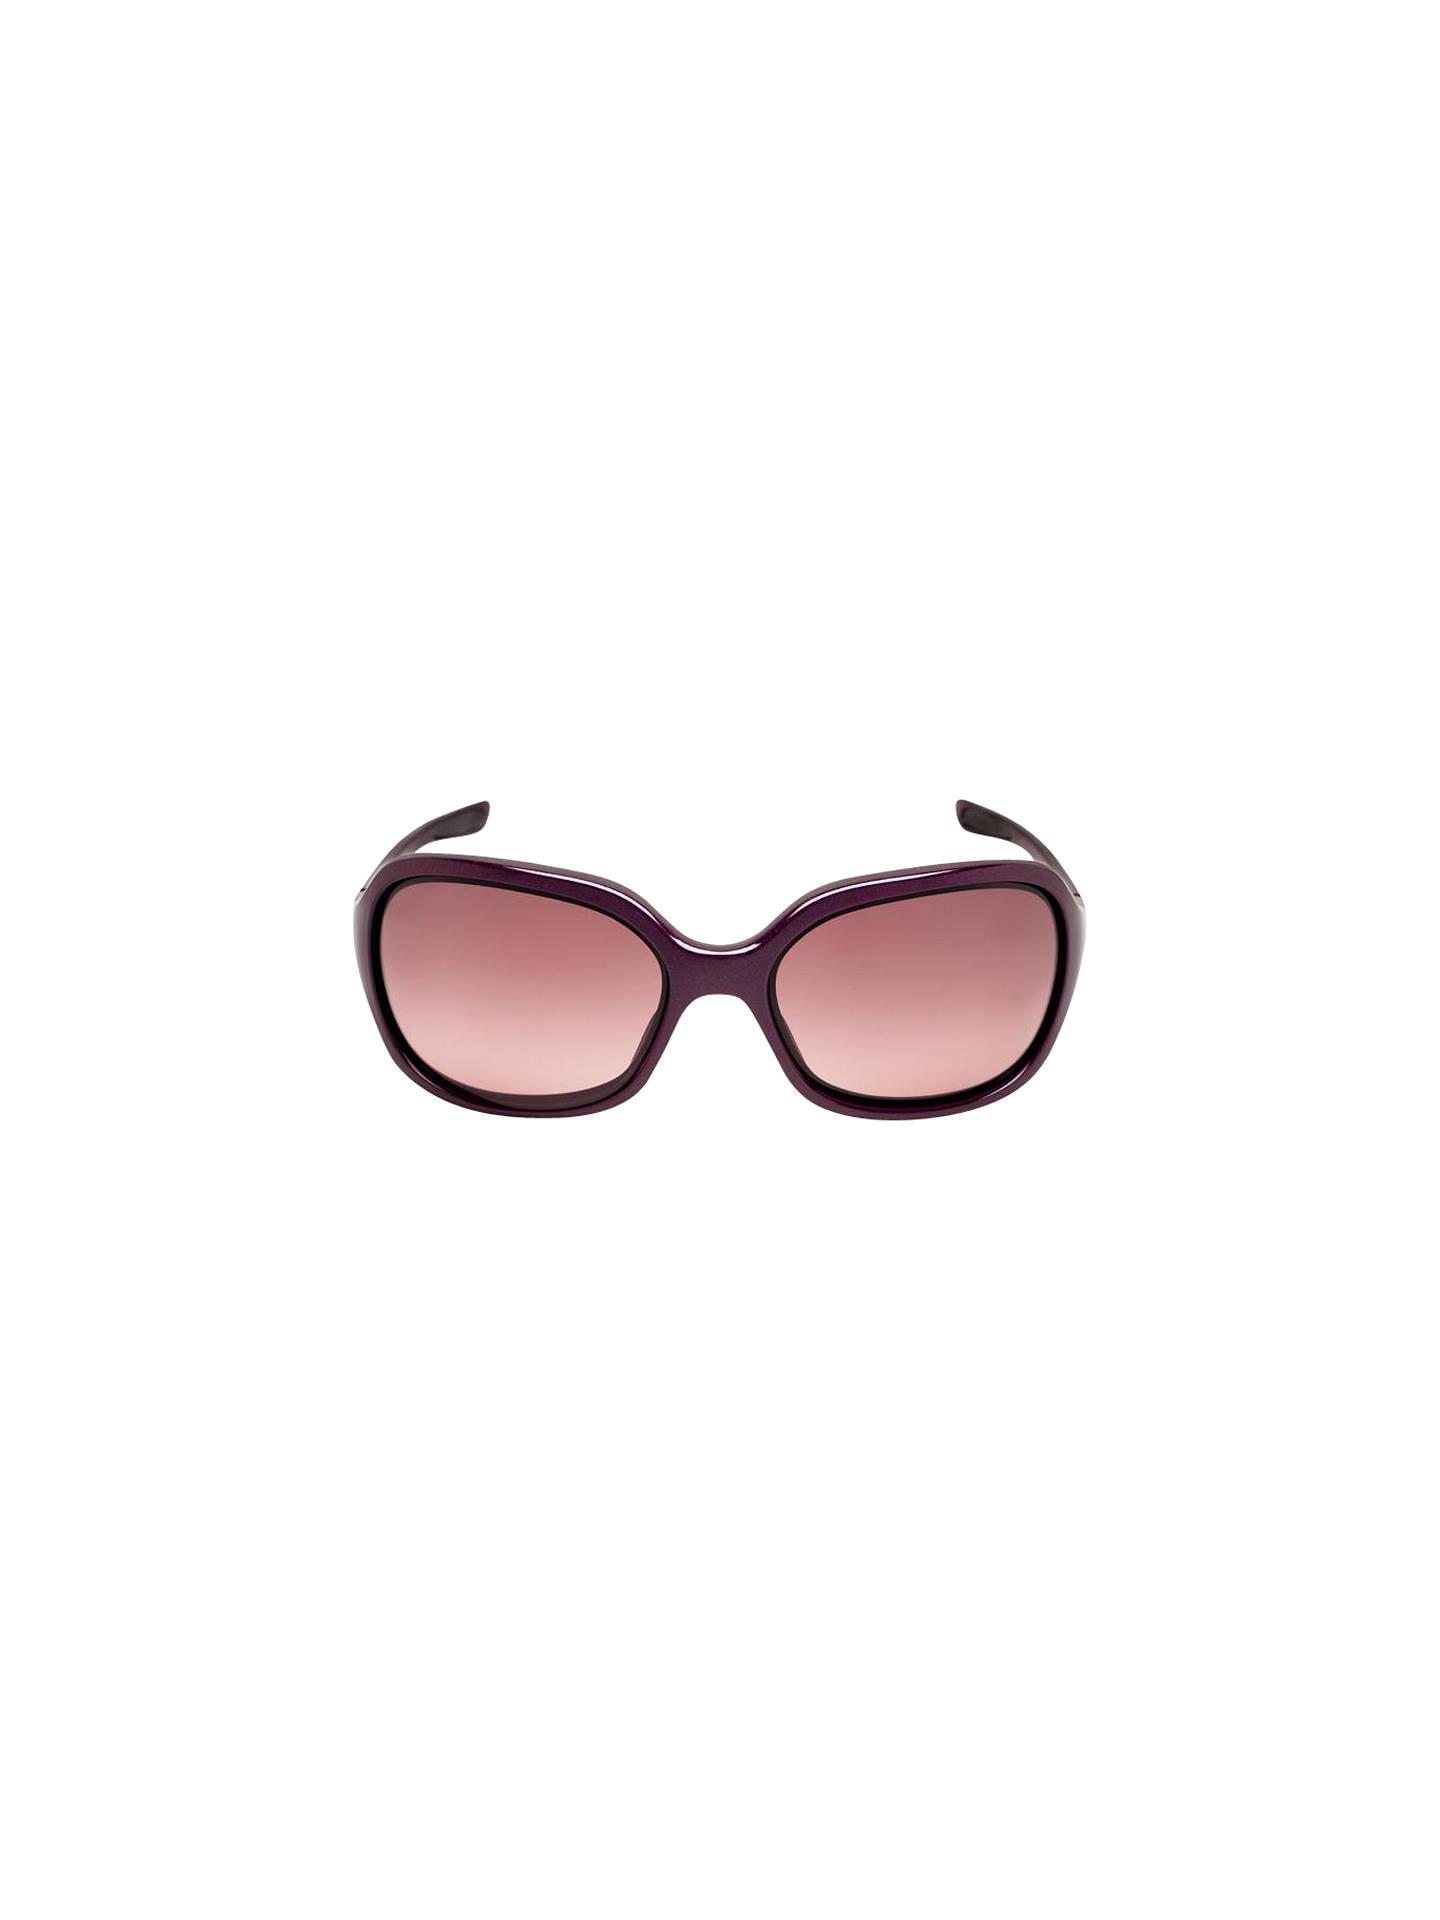 bfec878b7e ... BuyOakley OO9198 919812 Pulse Wrap Around Acetate Square Framed  Sunglasses